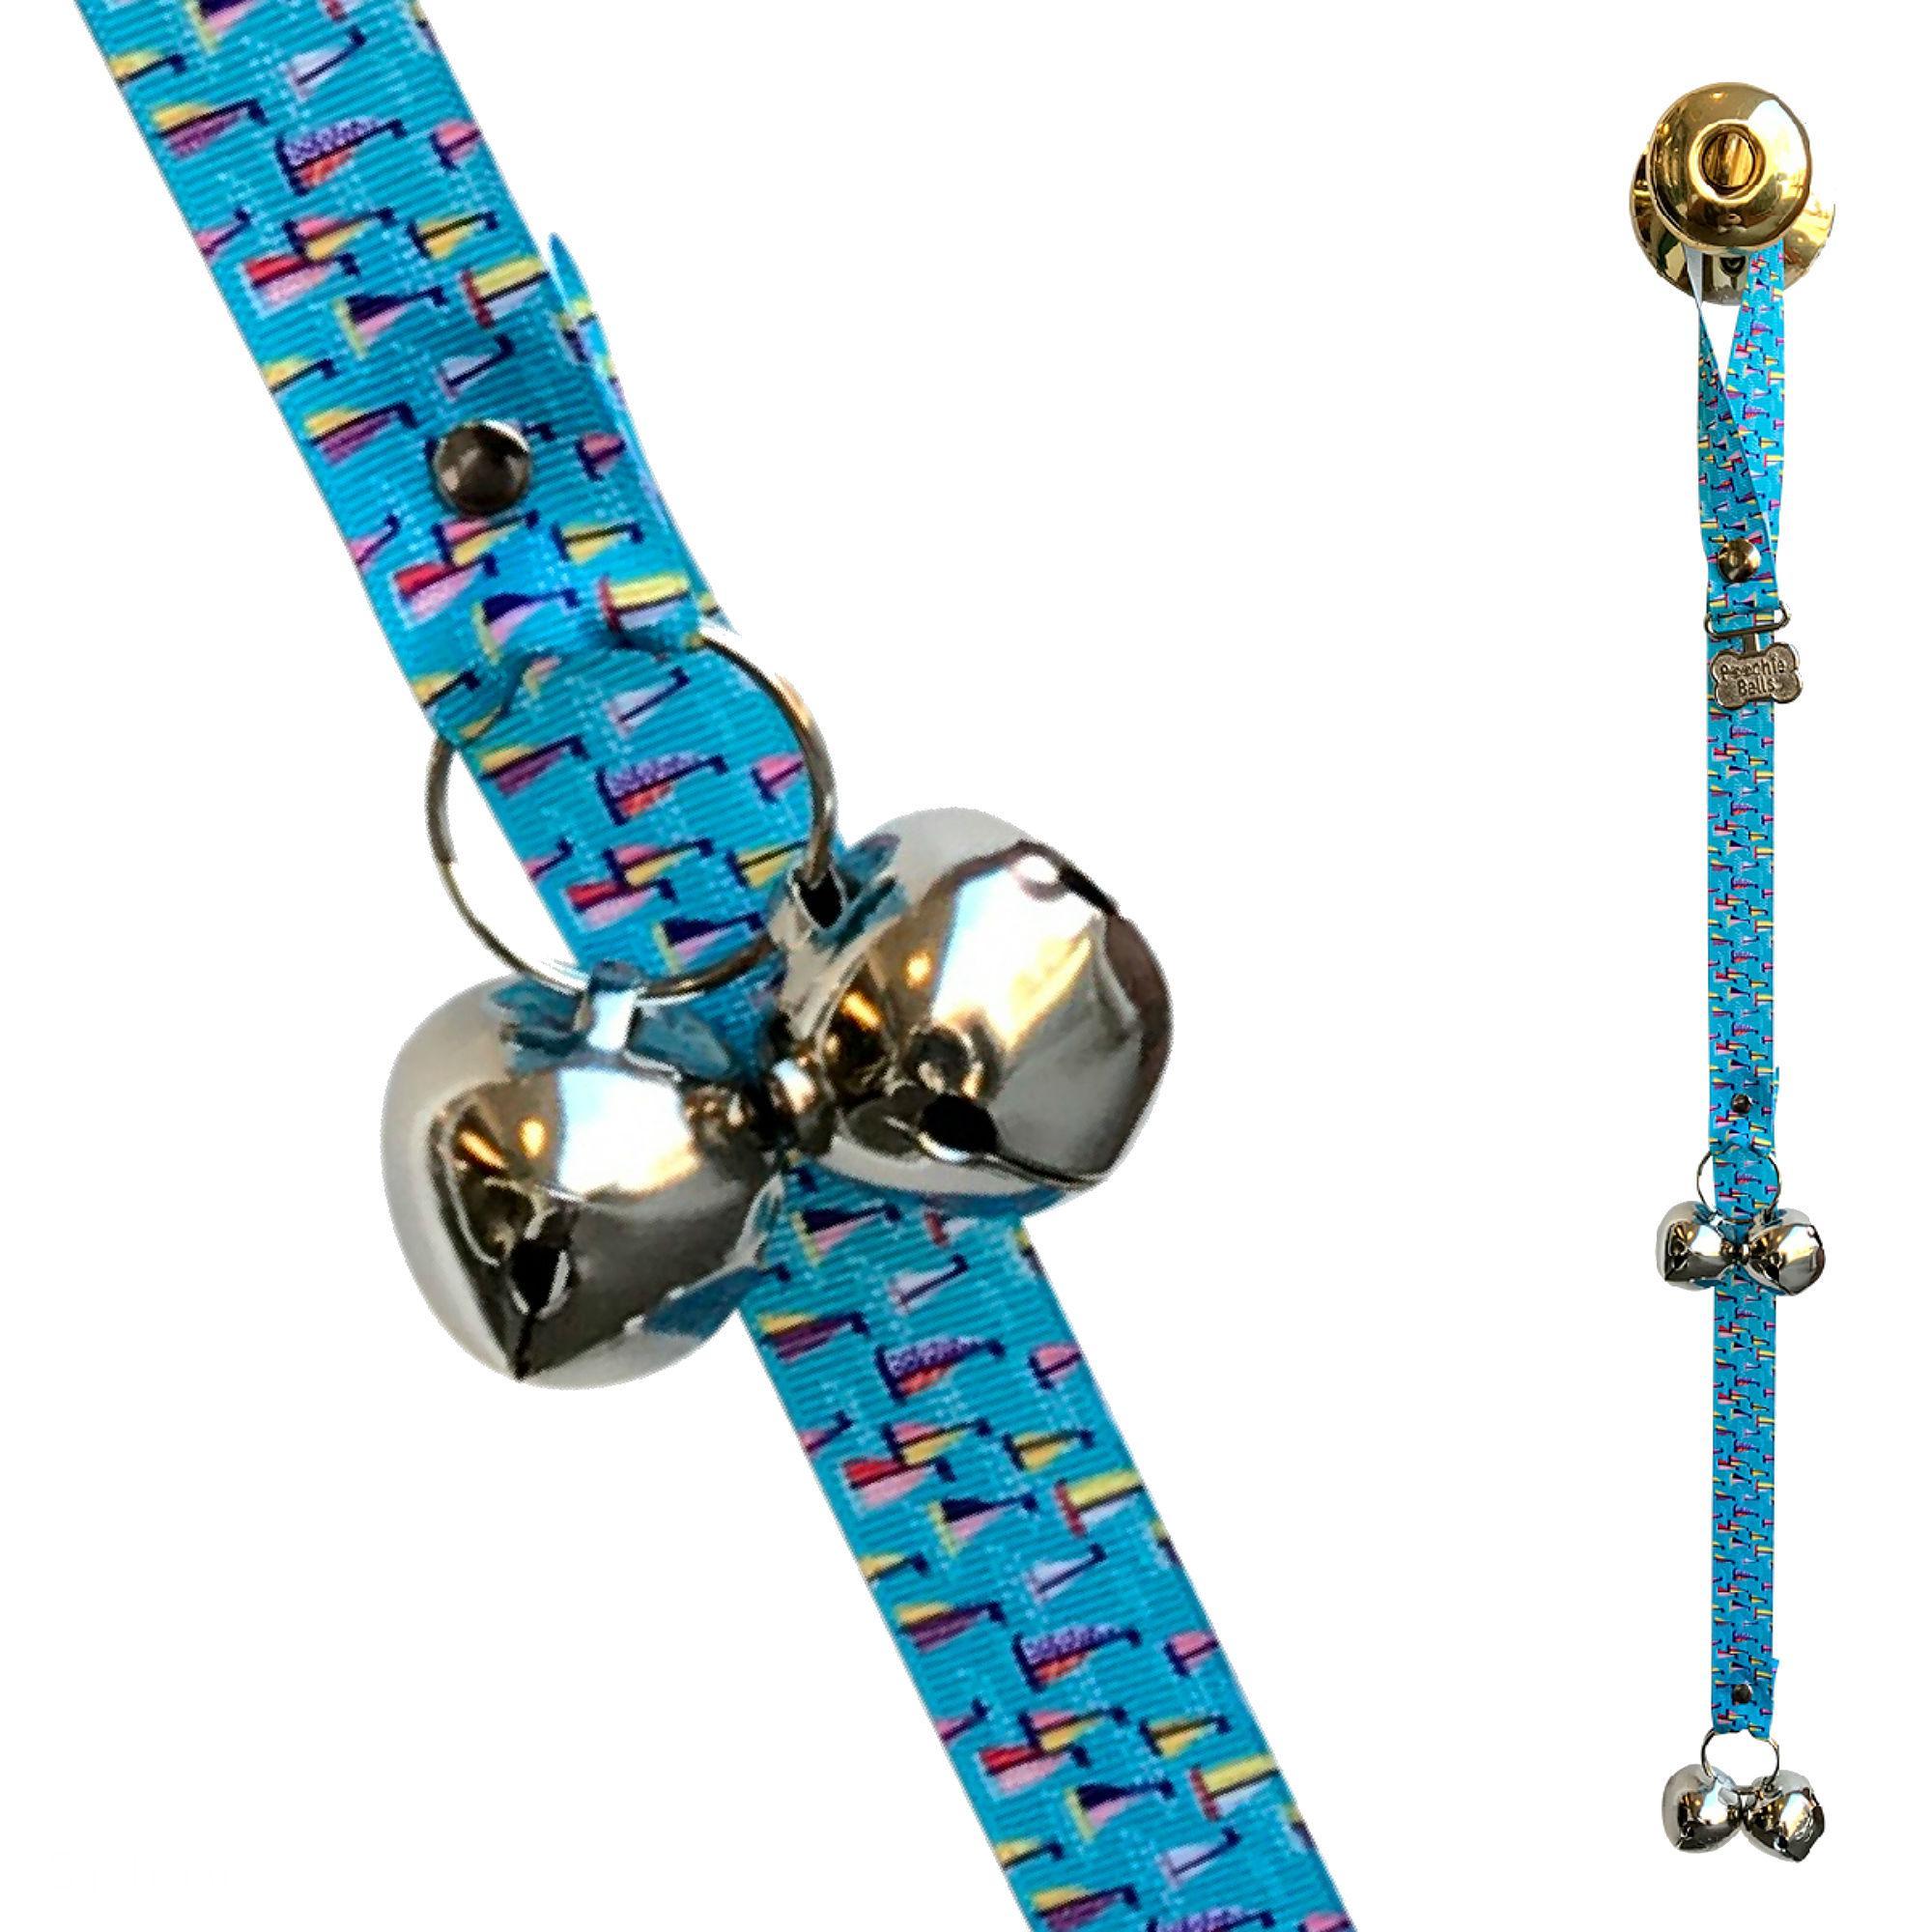 Poochie Bells Dog Doorbell Coastal Collection - Sailboats